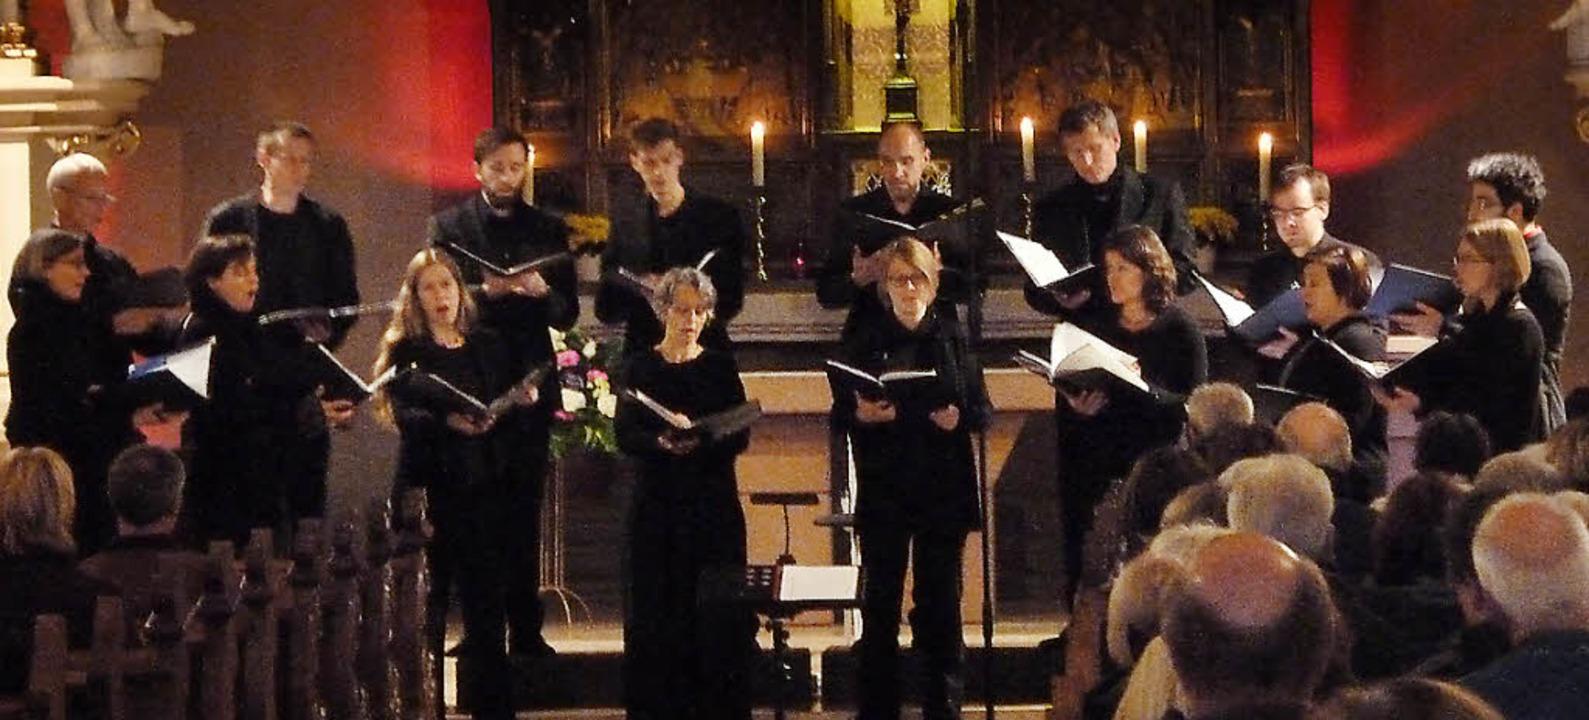 Das John Sheppard-Ensemble besteht seit 20 Jahren.    | Foto: Matthias Franz